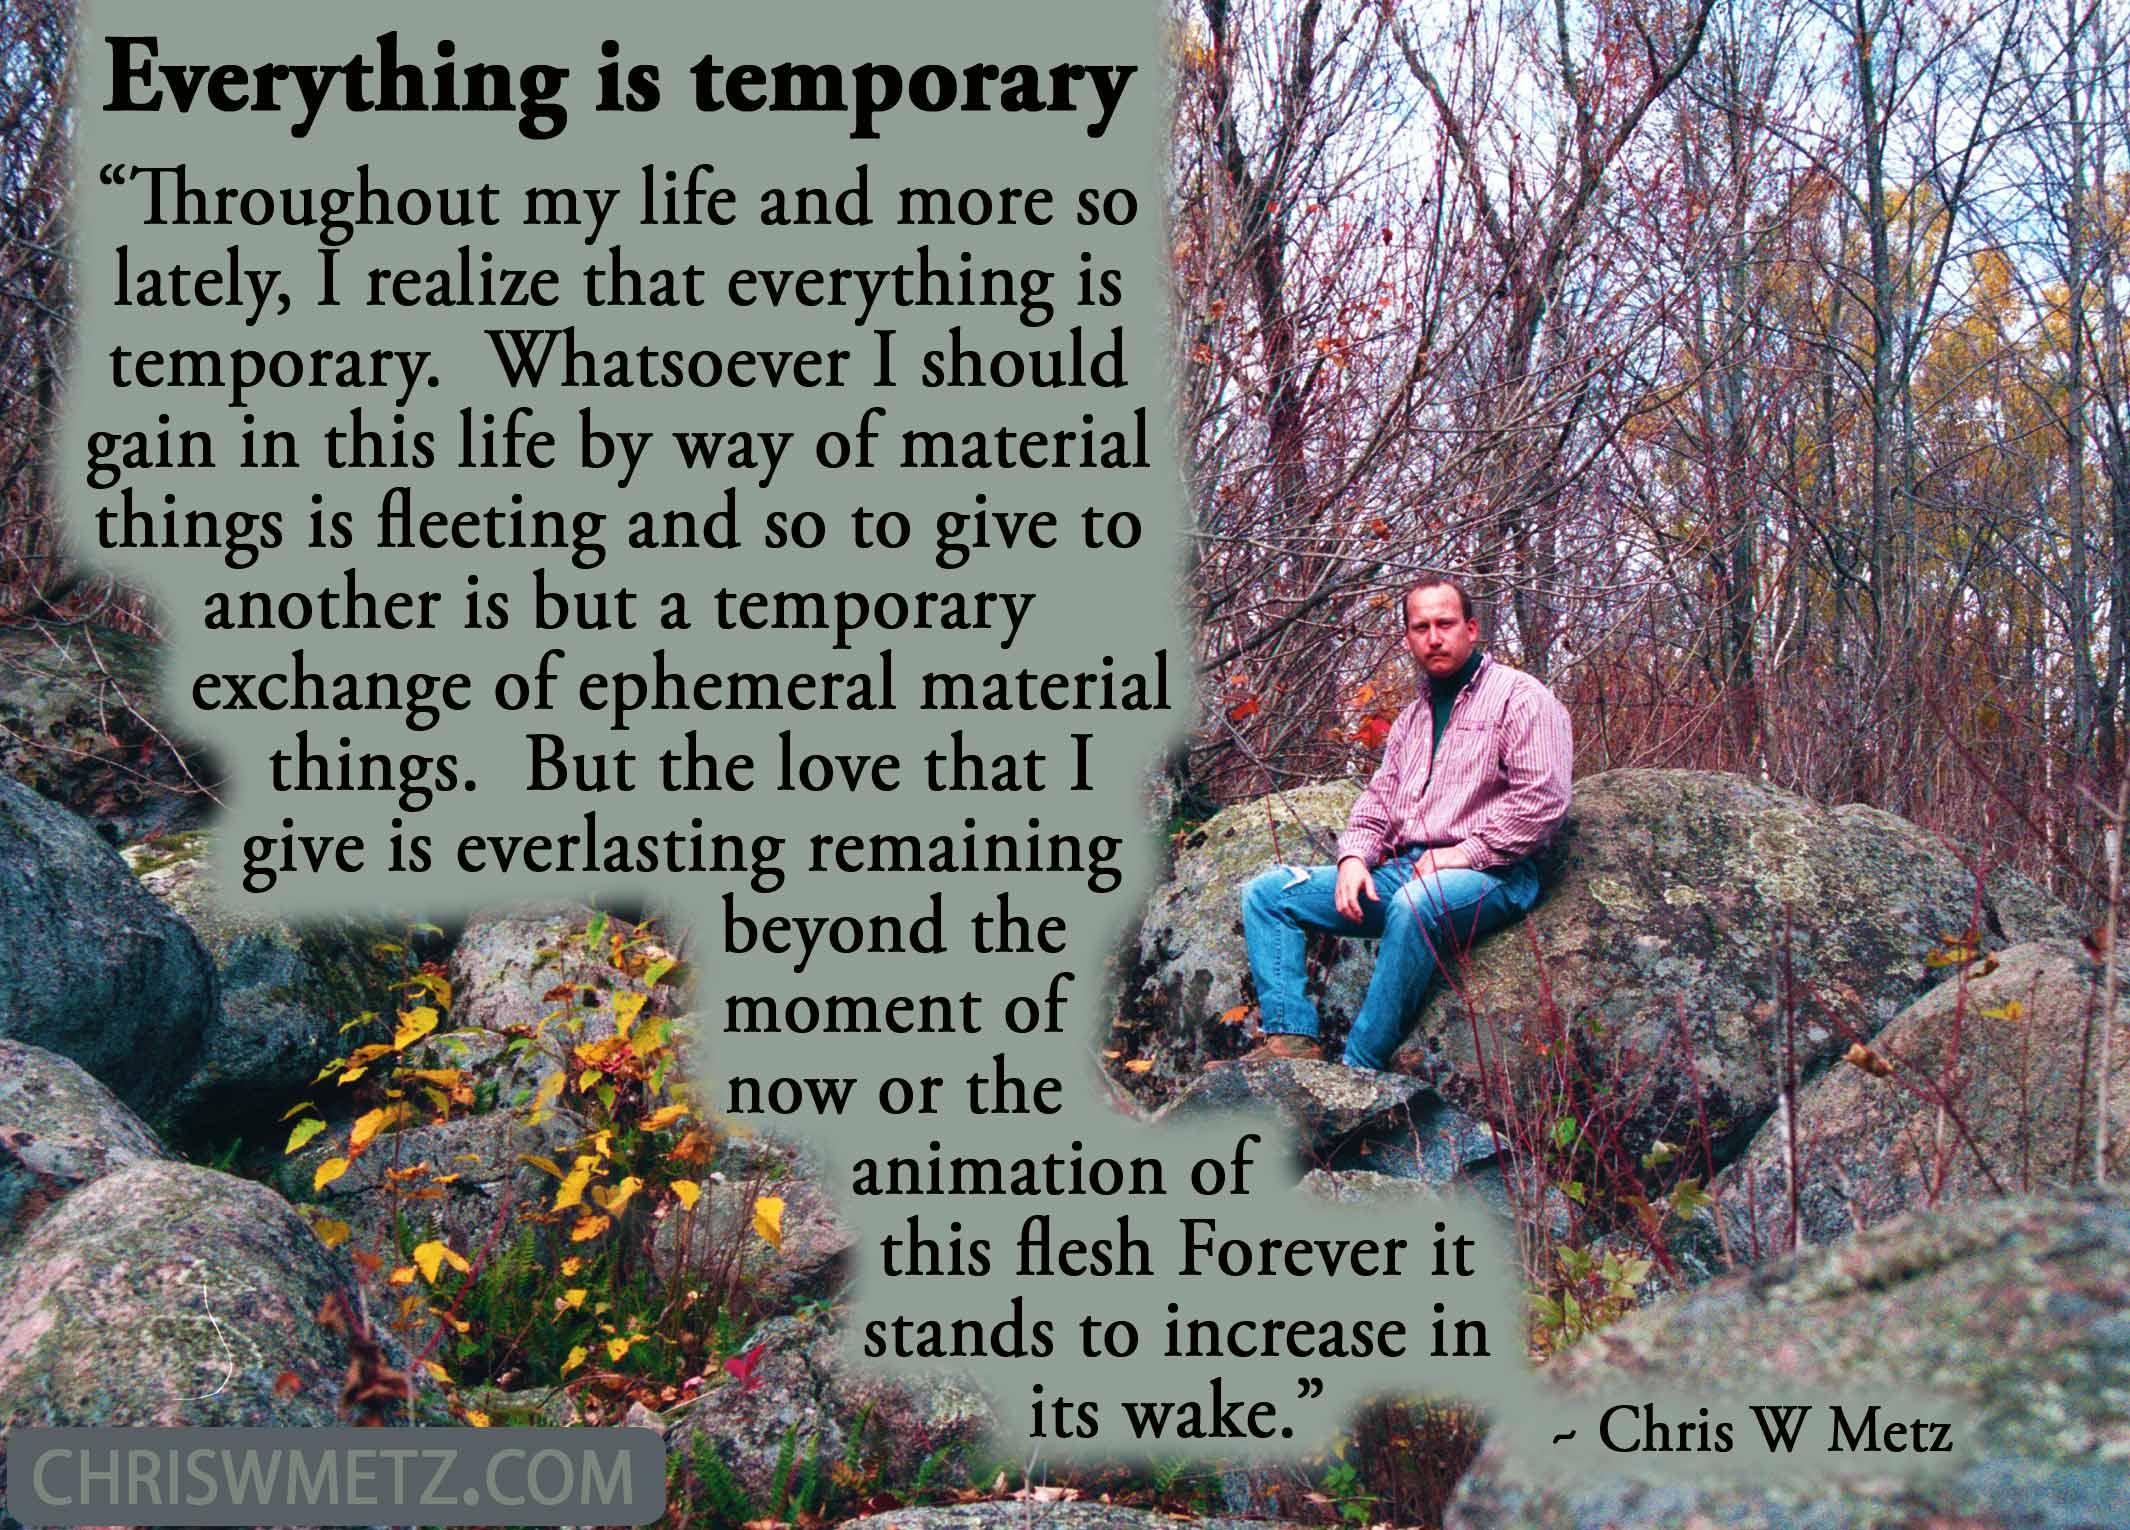 Love Quote 19 Chris Metz Chriswmetz.com